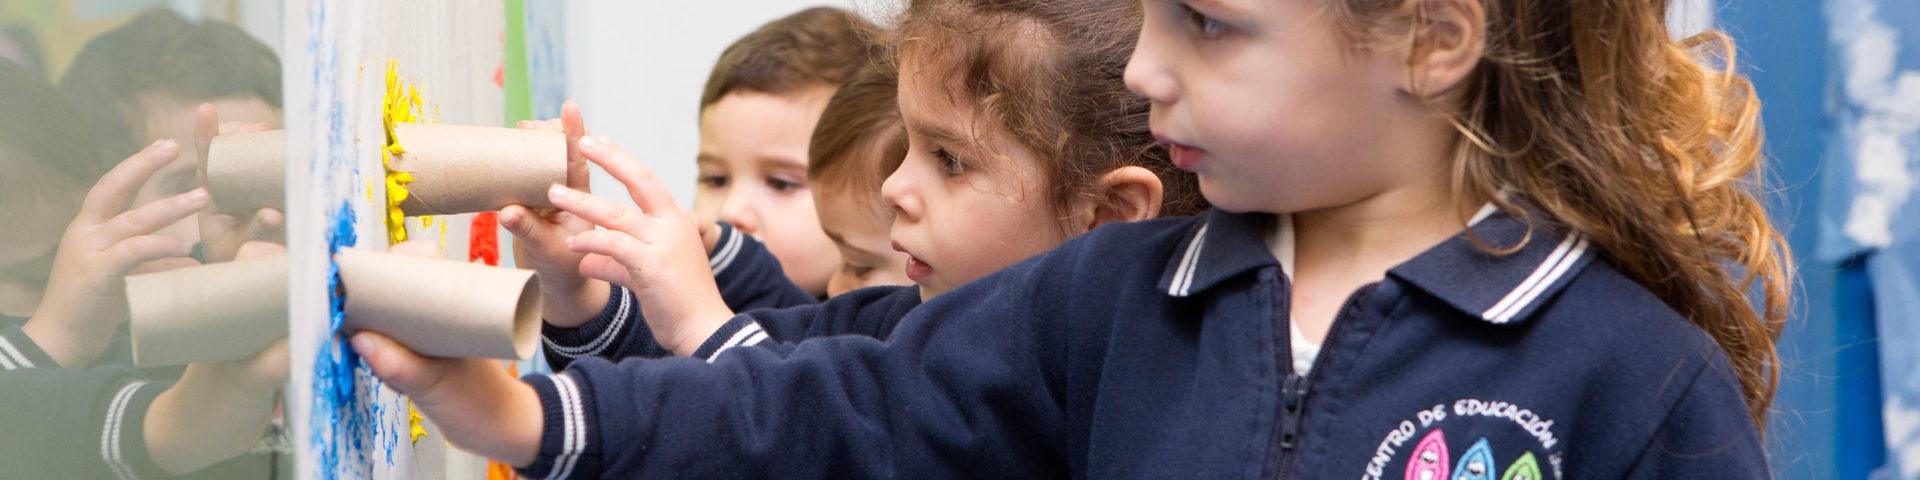 Escuelas Infantiles Lápices_matrícula